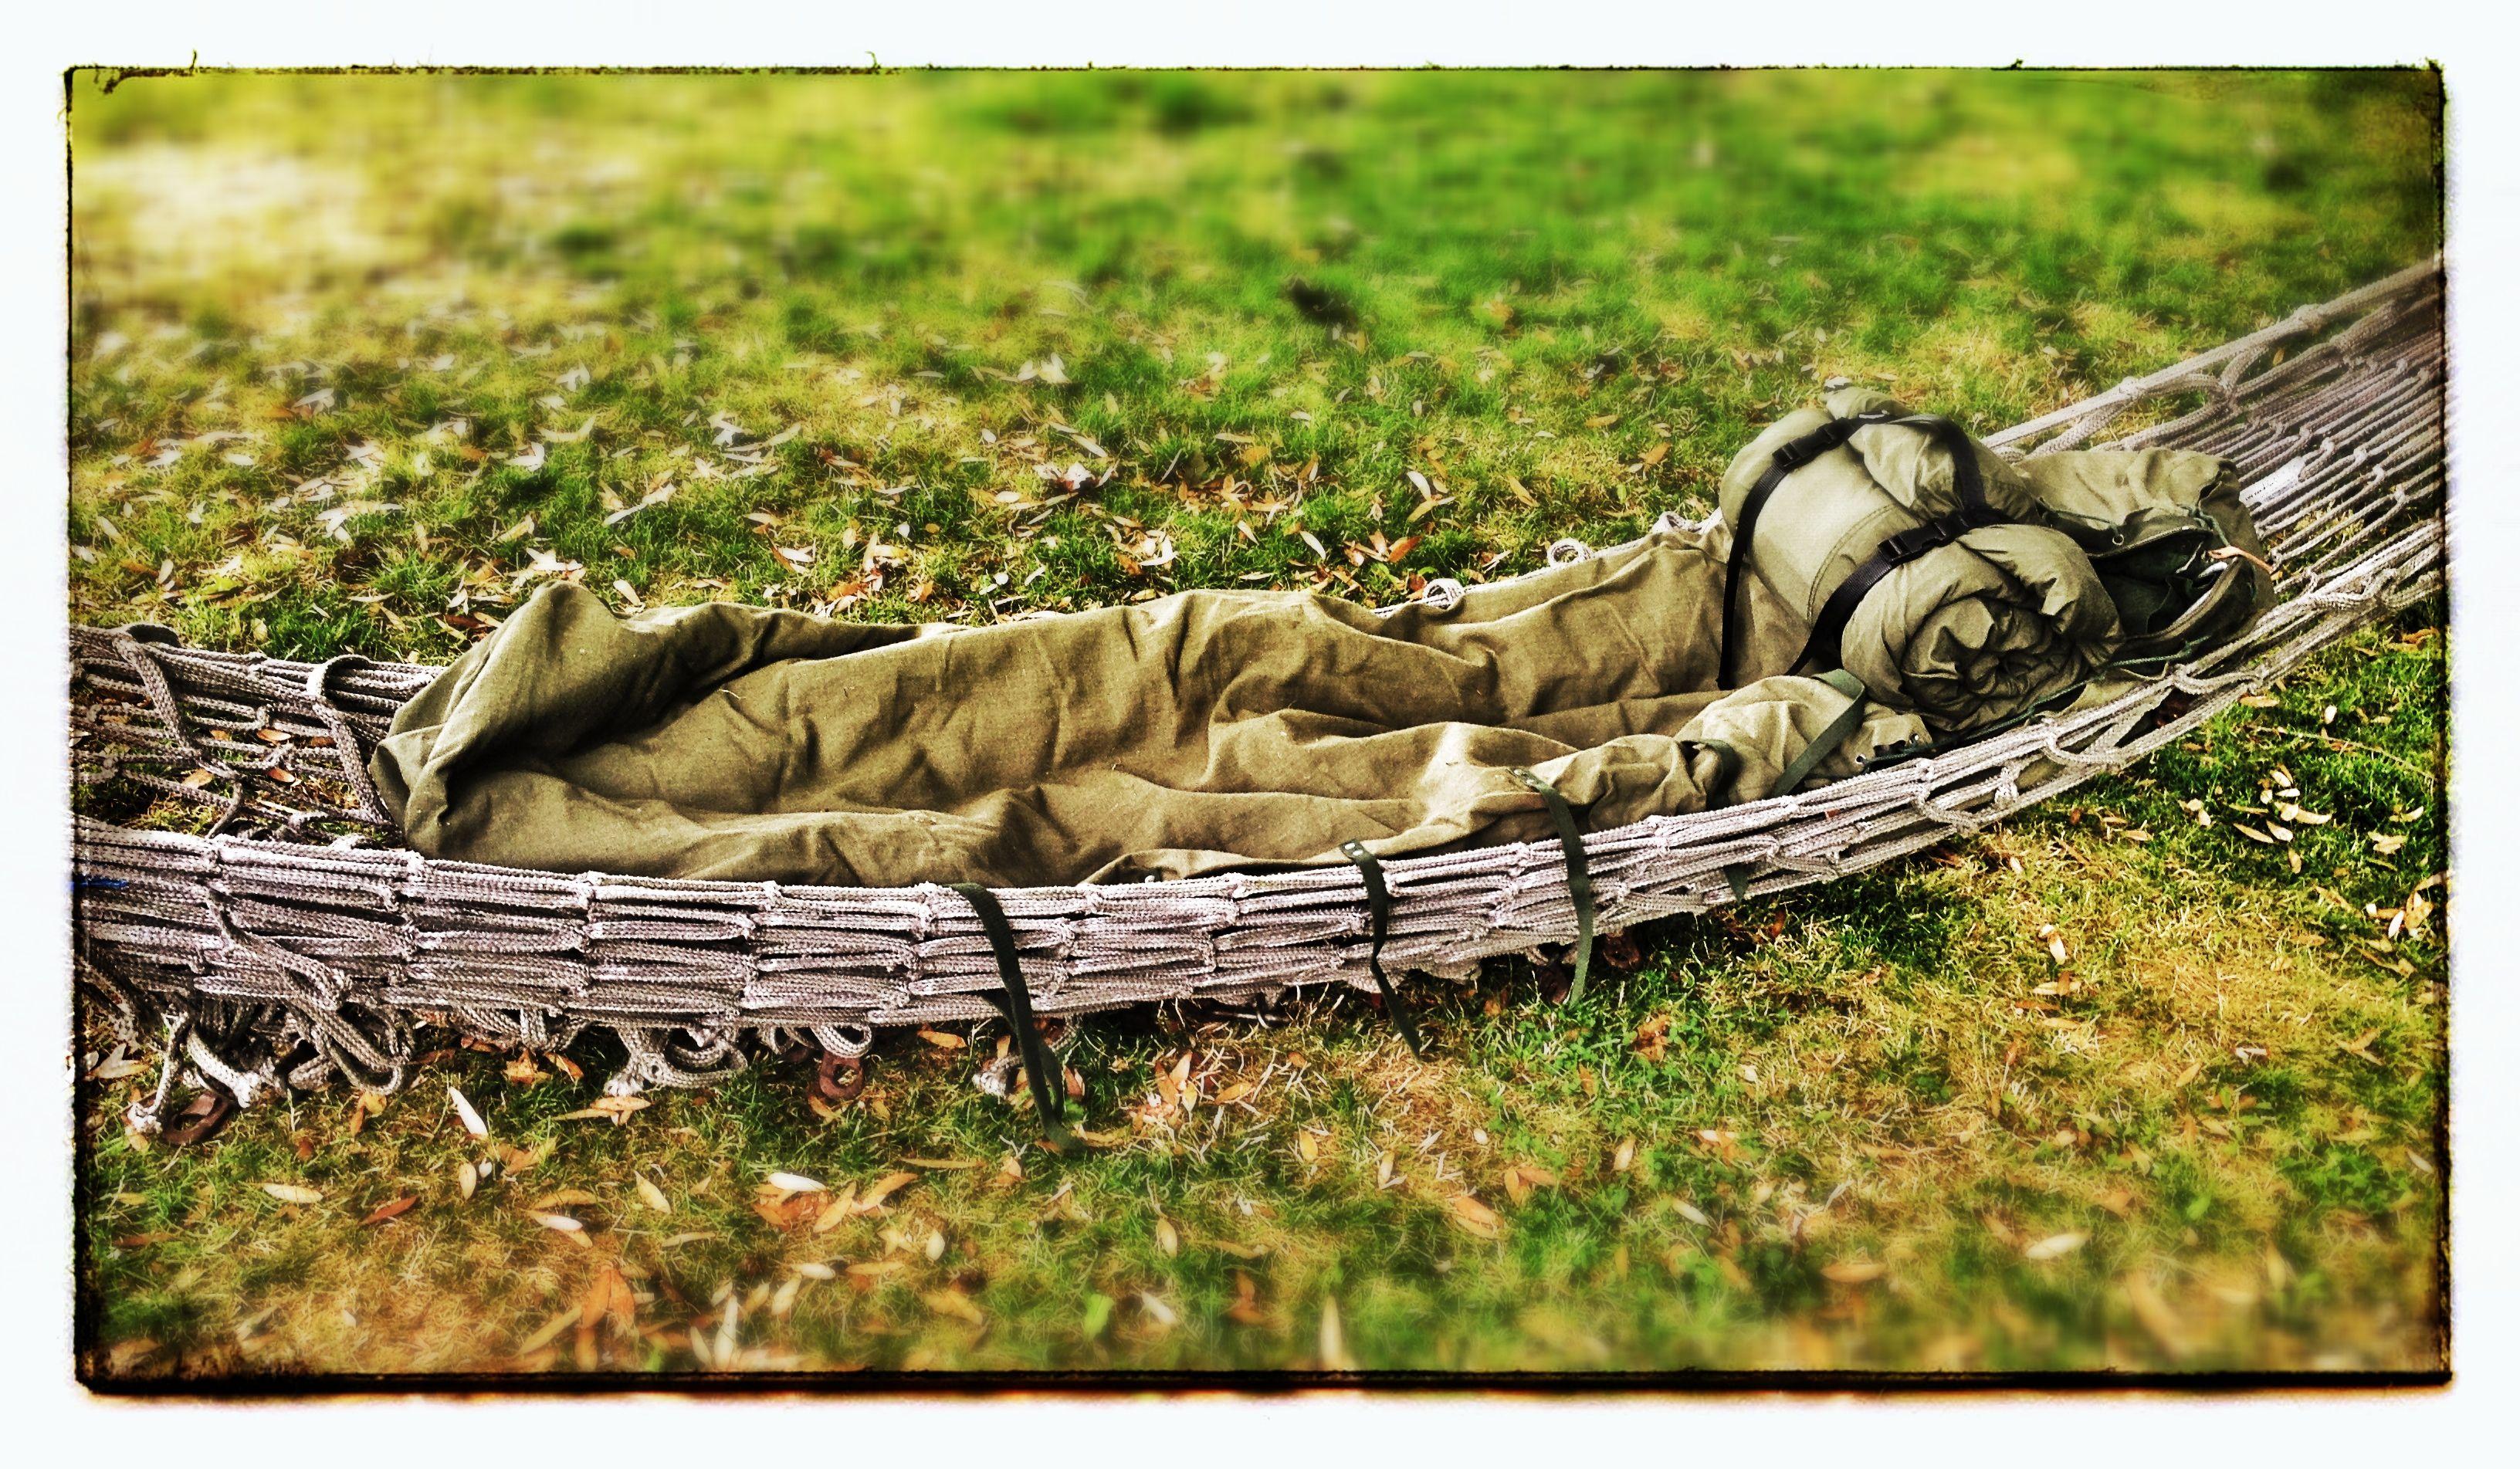 Army Cargo Net Hammock With Wool Amp Canvas Vintage Sleeping